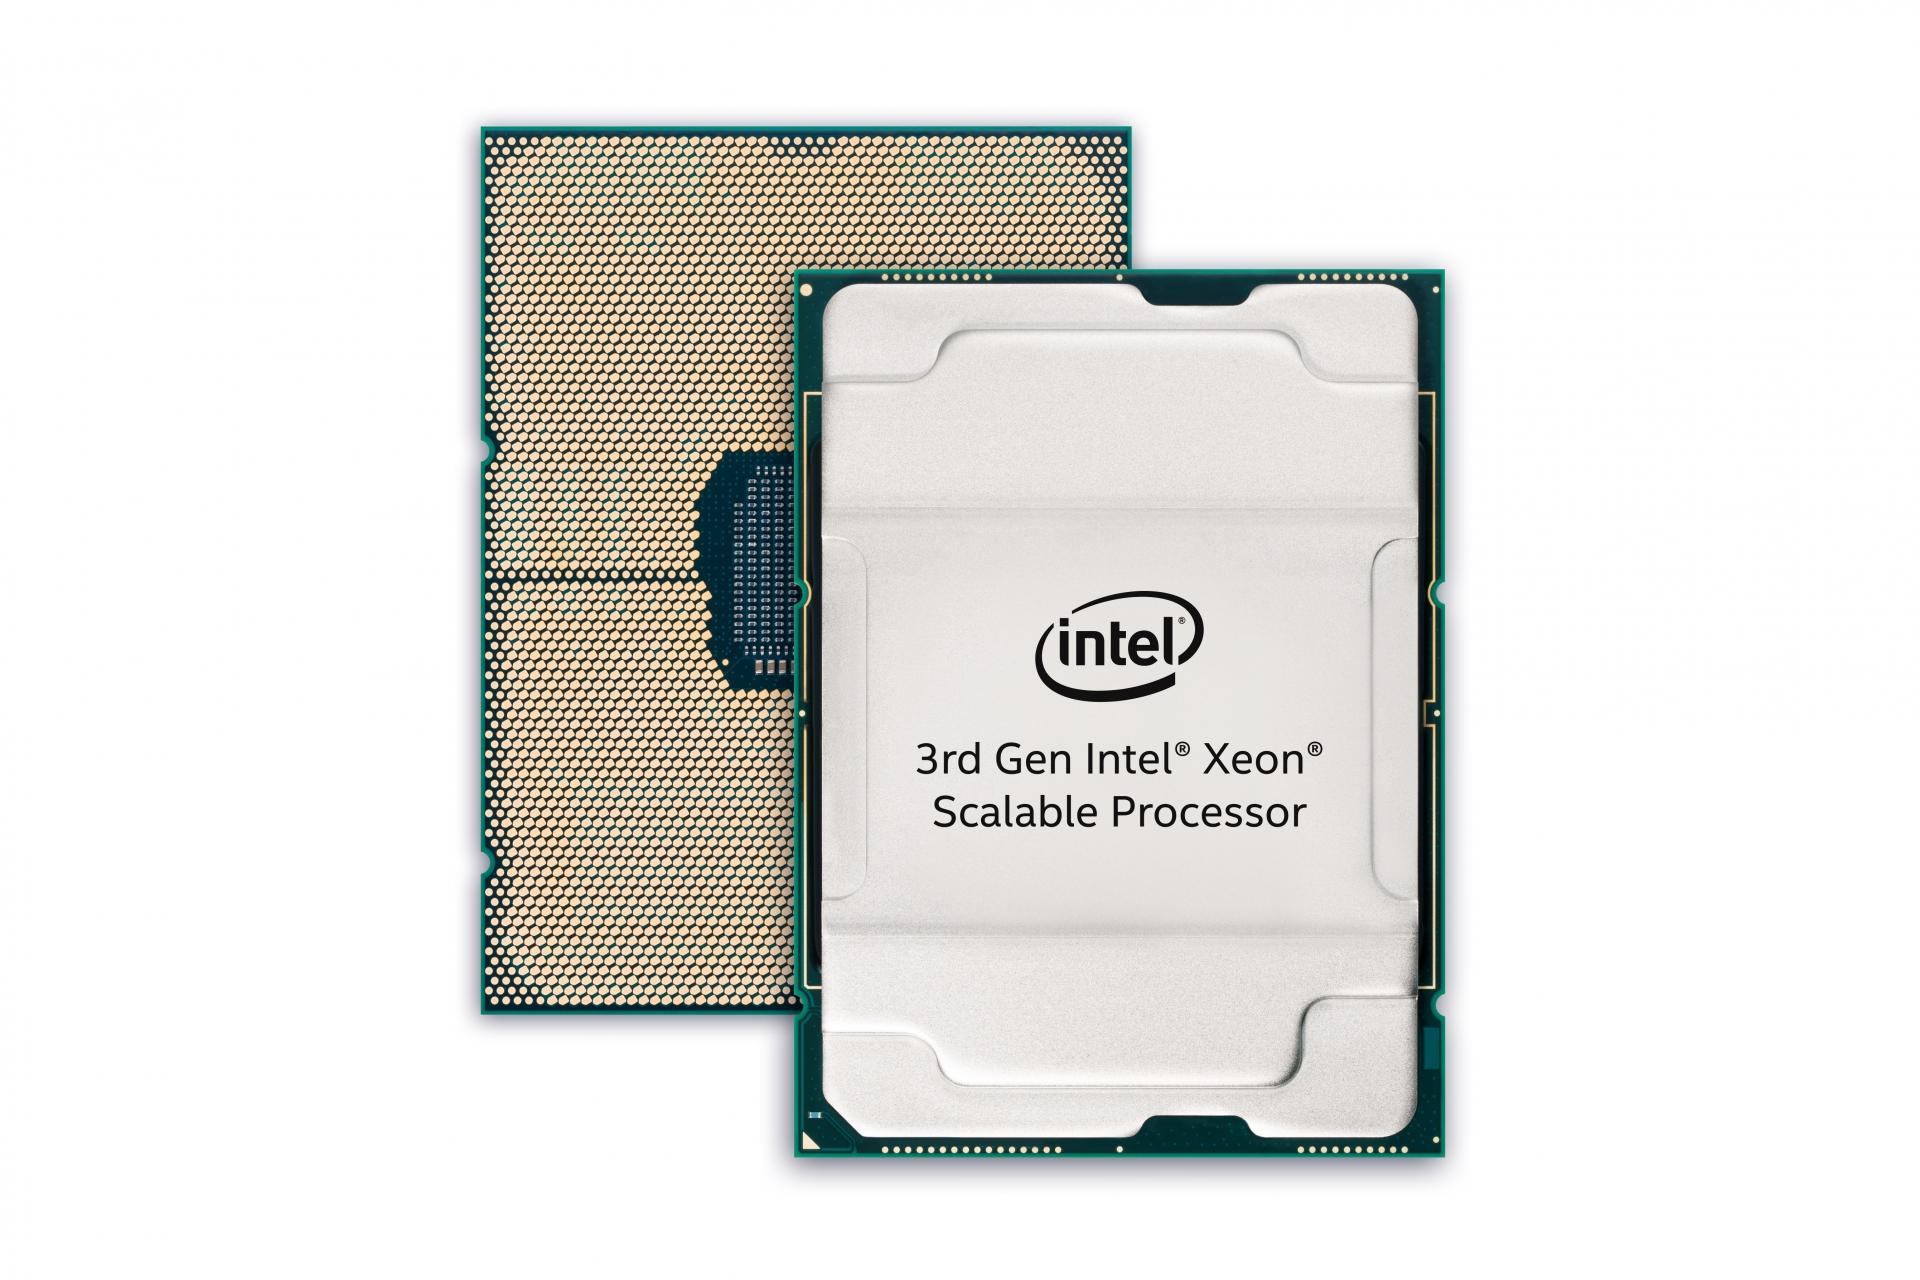 Intel announces unmatched AI and analytics platform